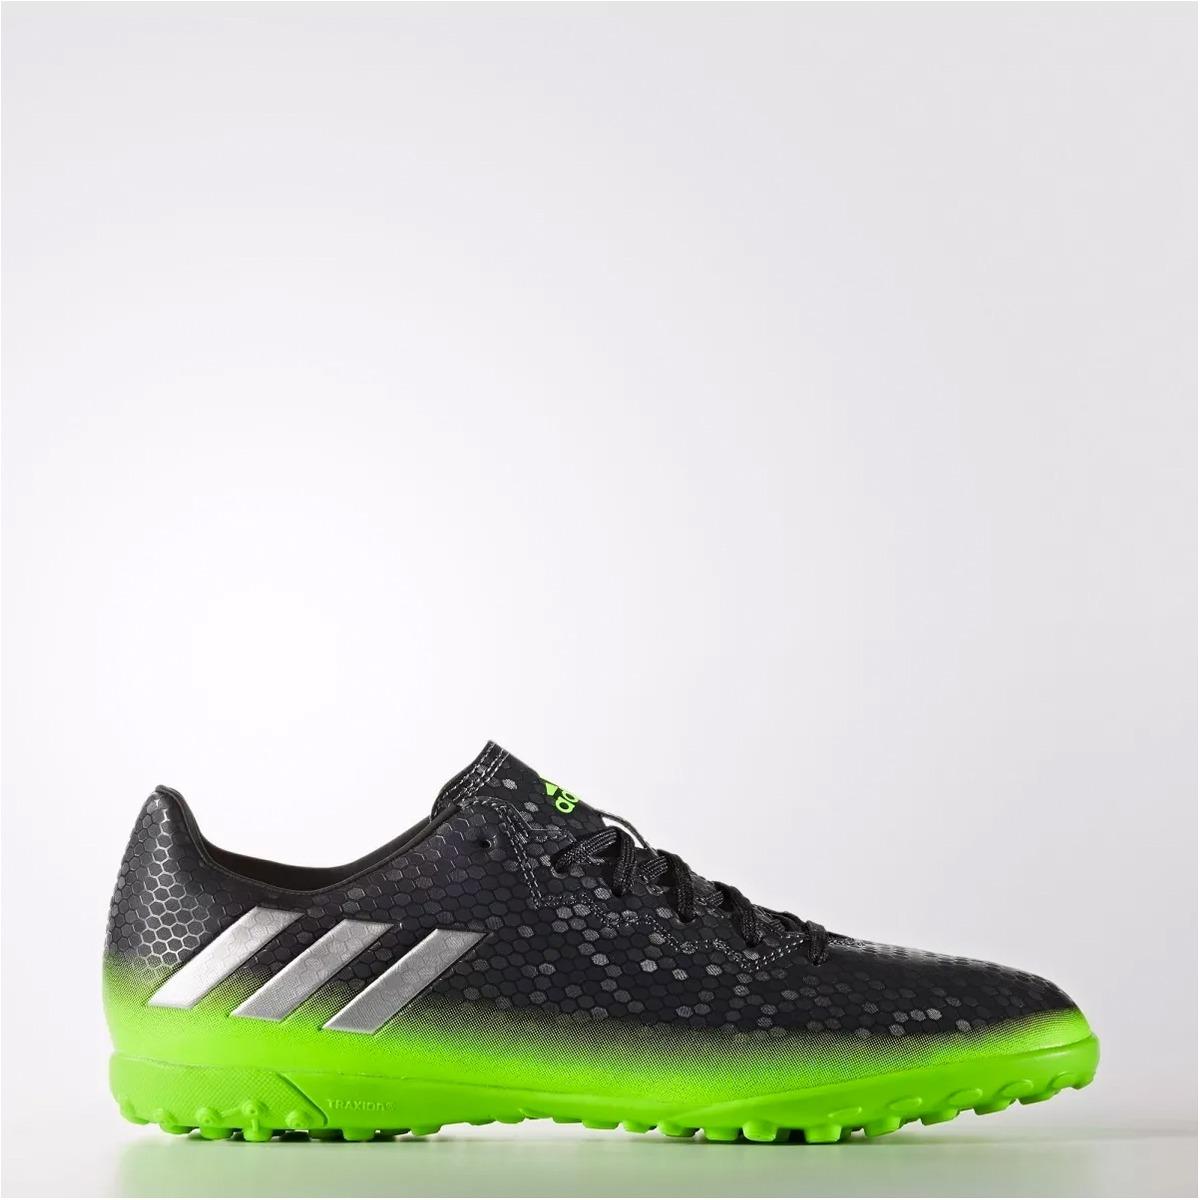 7c5c256b0004c zapatos futbol soccer pasto sintetico messi 16.4 turf adidas. Cargando zoom.